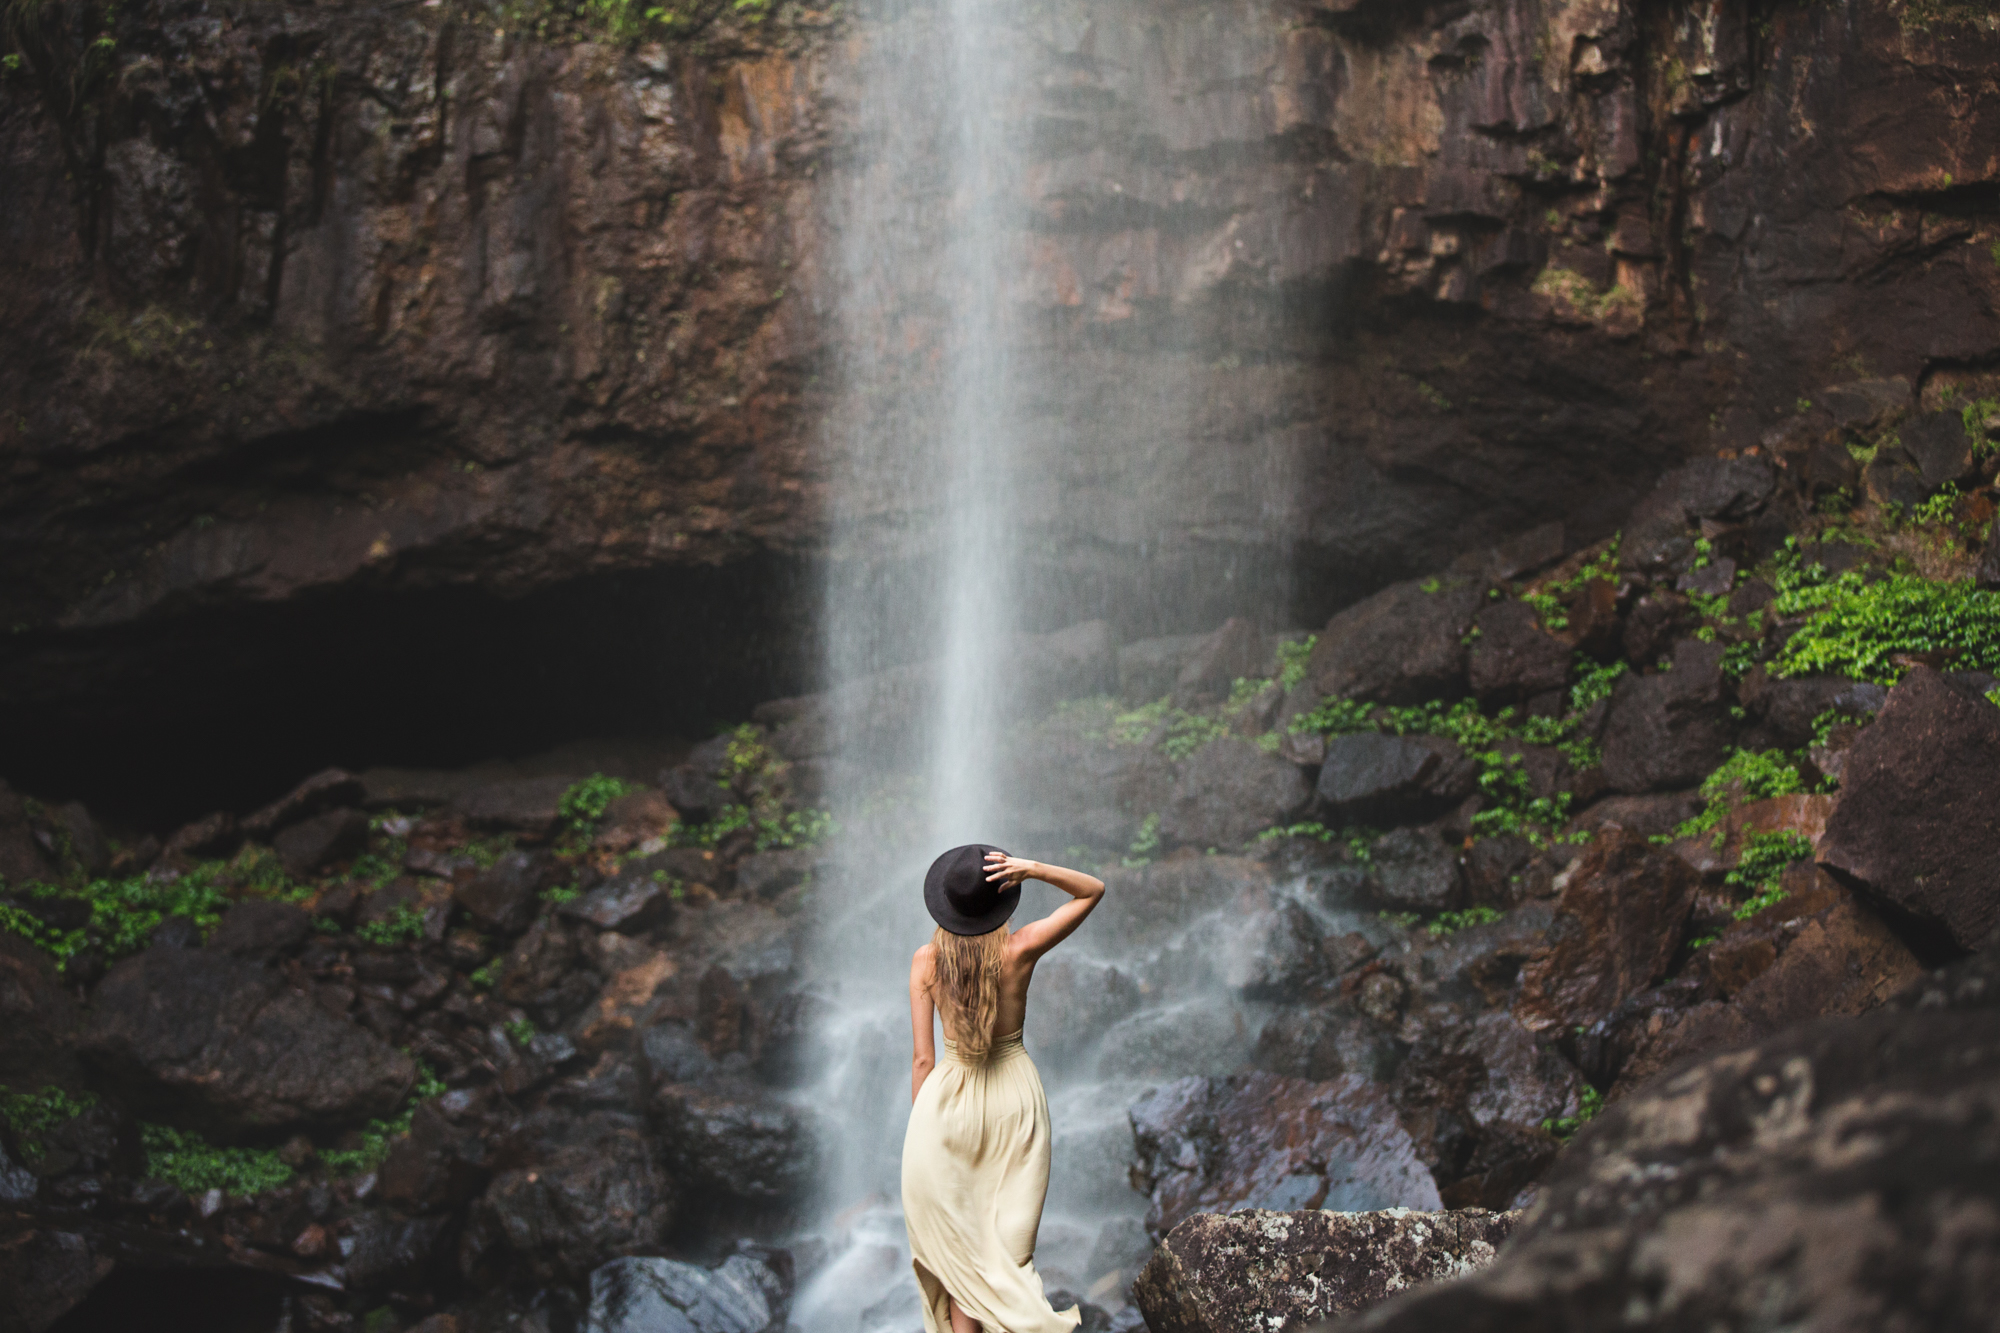 39-Bec_Kilpatrick_Photography_AustraliaATP_01892